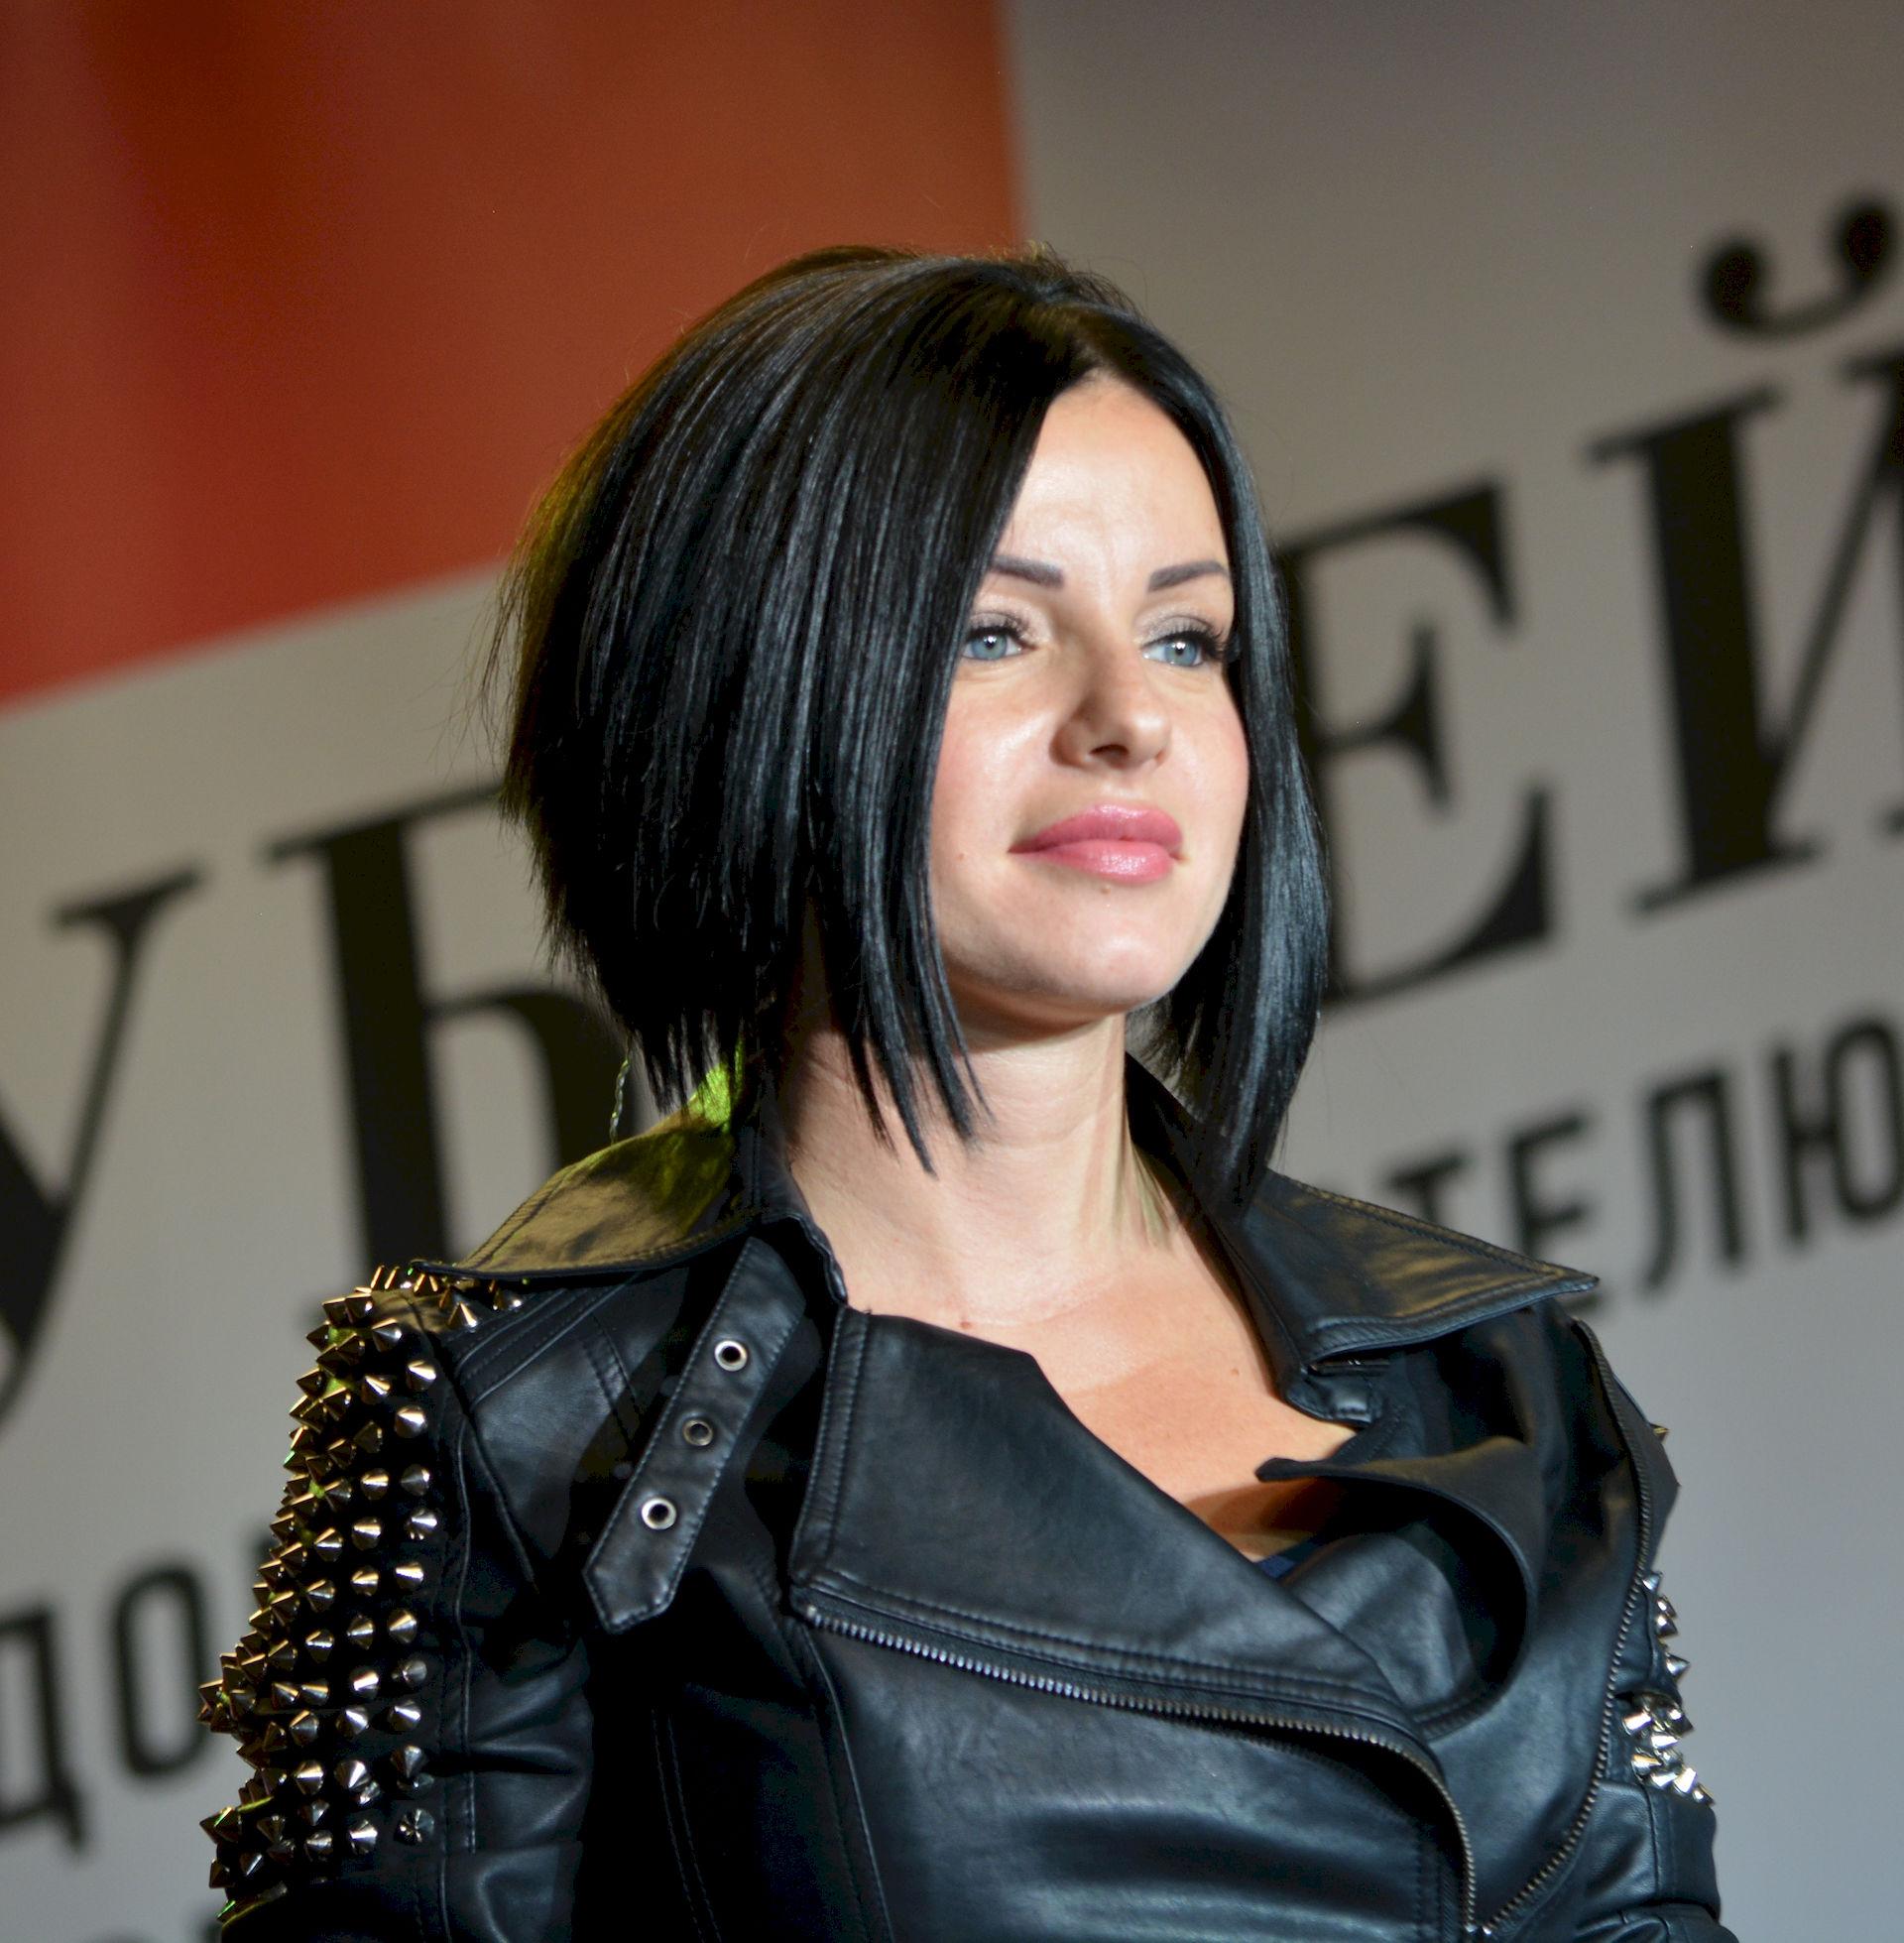 Photo of Julia Volkova: Russian singer, member of the duo t.A.T.u